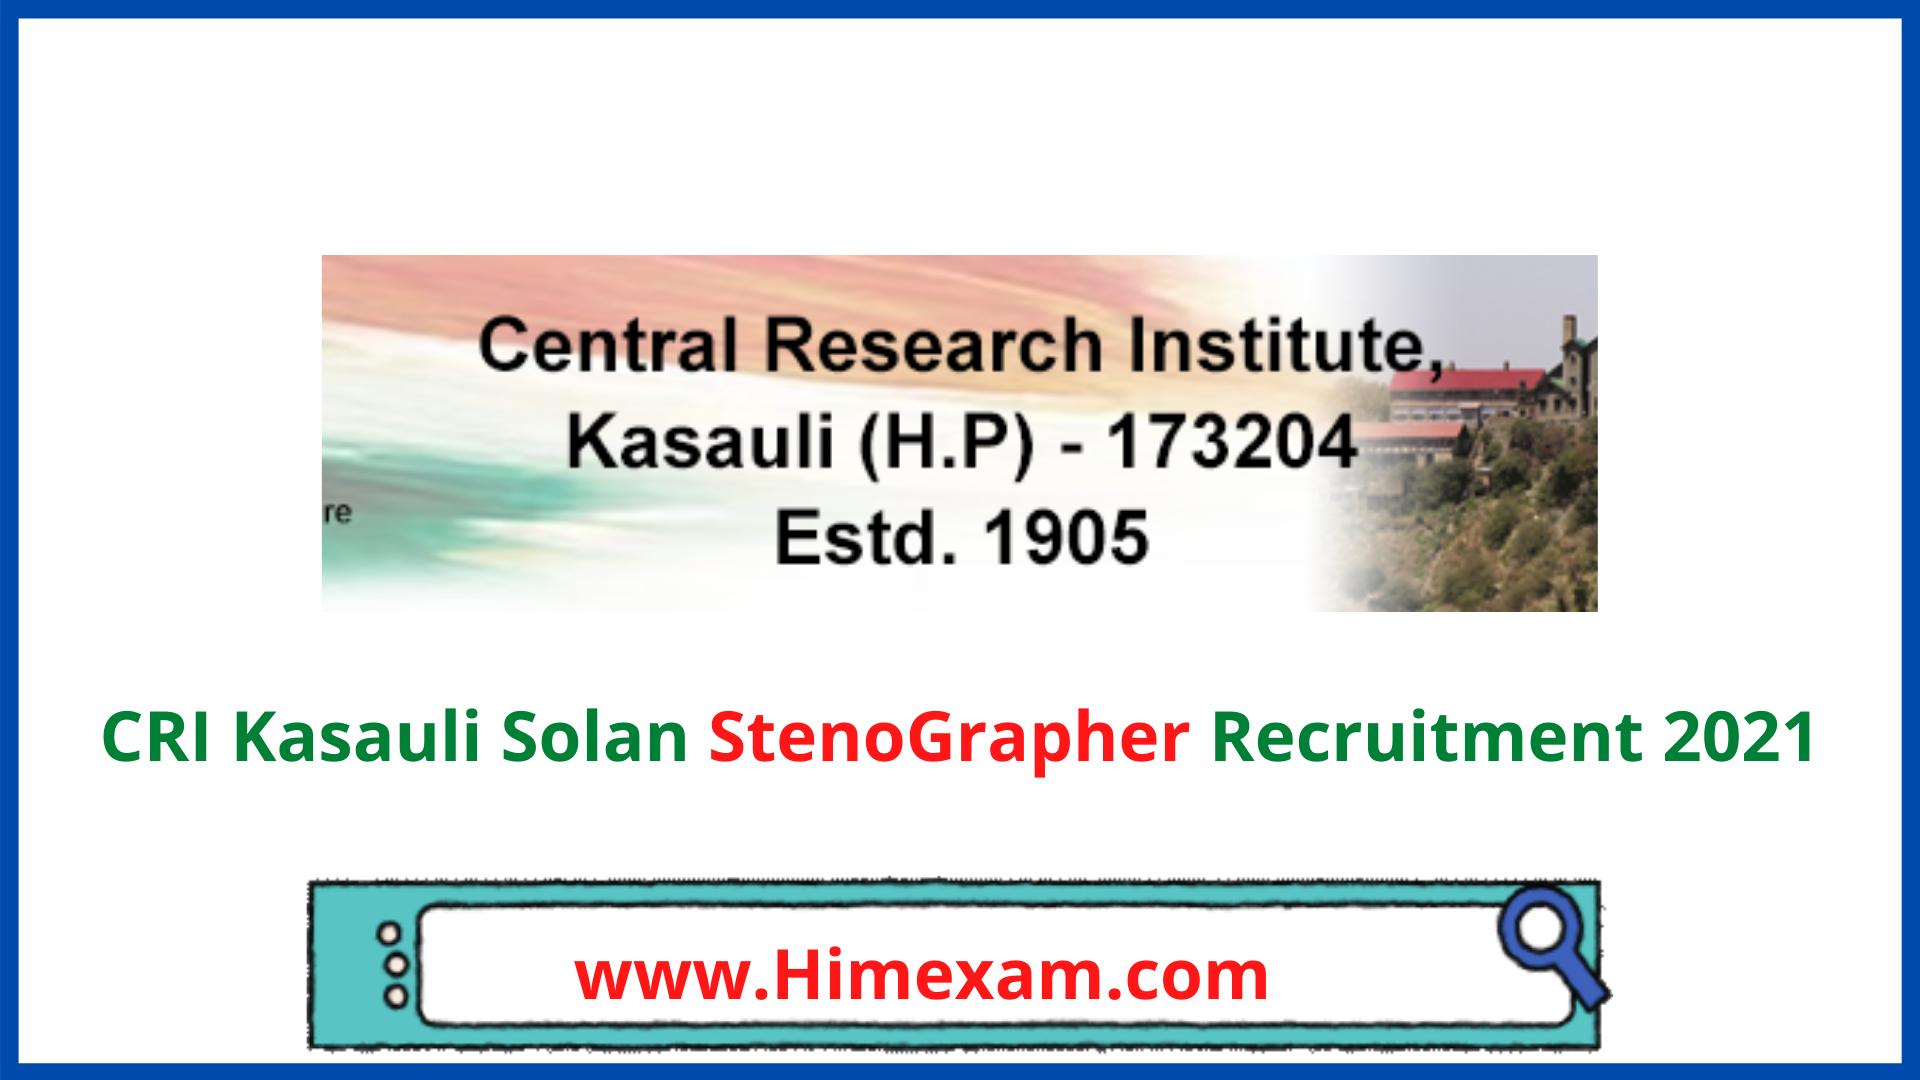 CRI Kasauli Solan StenoGrapher Recruitment 2021